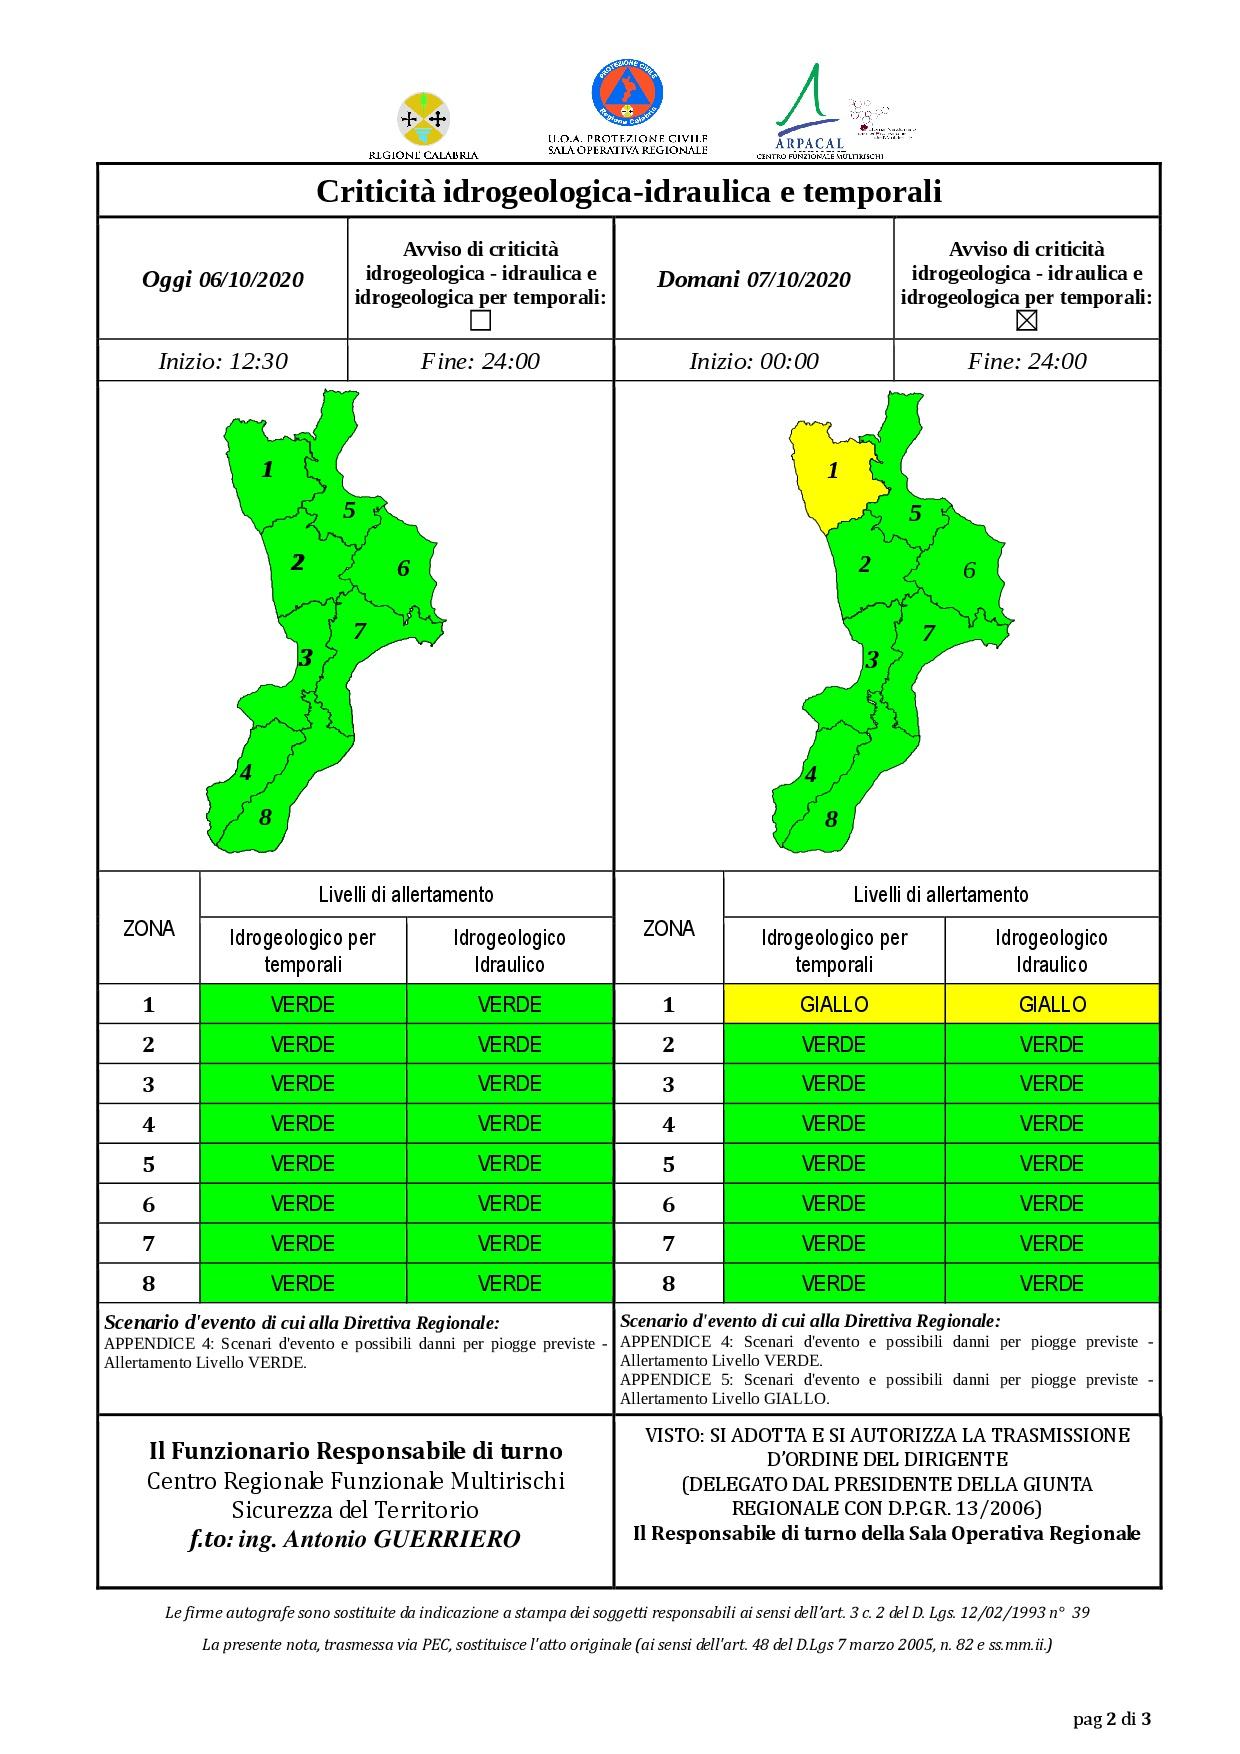 Criticità idrogeologica-idraulica e temporali in Calabria 06-10-2020